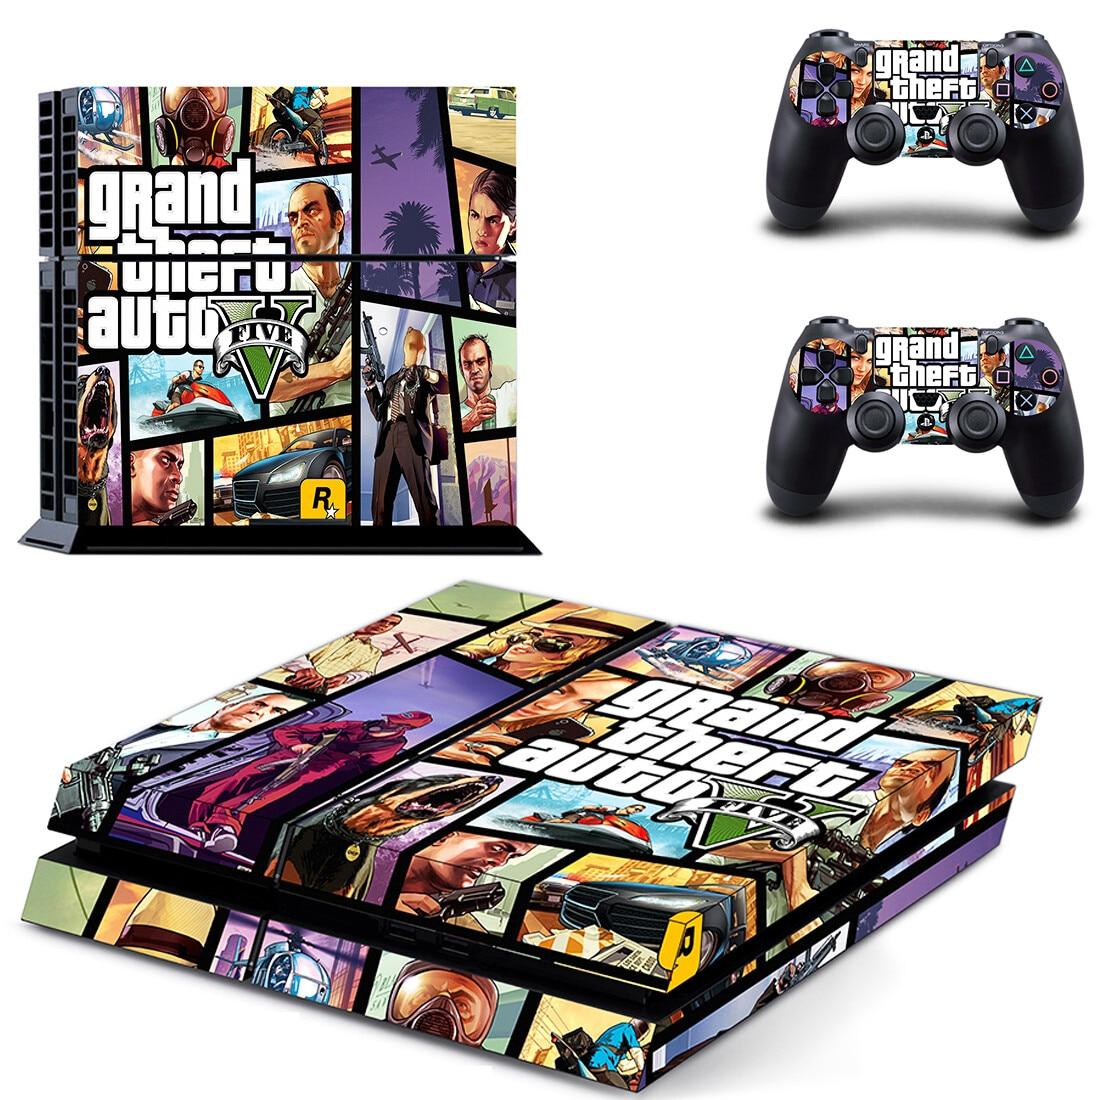 GTA5 GTA PS4 ملصقات بلاي ستيشن 4 الجلد ملصقا الشارات غطاء للبلاي ستيشن 4 PS4 وحدة التحكم و تحكم جلود الفينيل